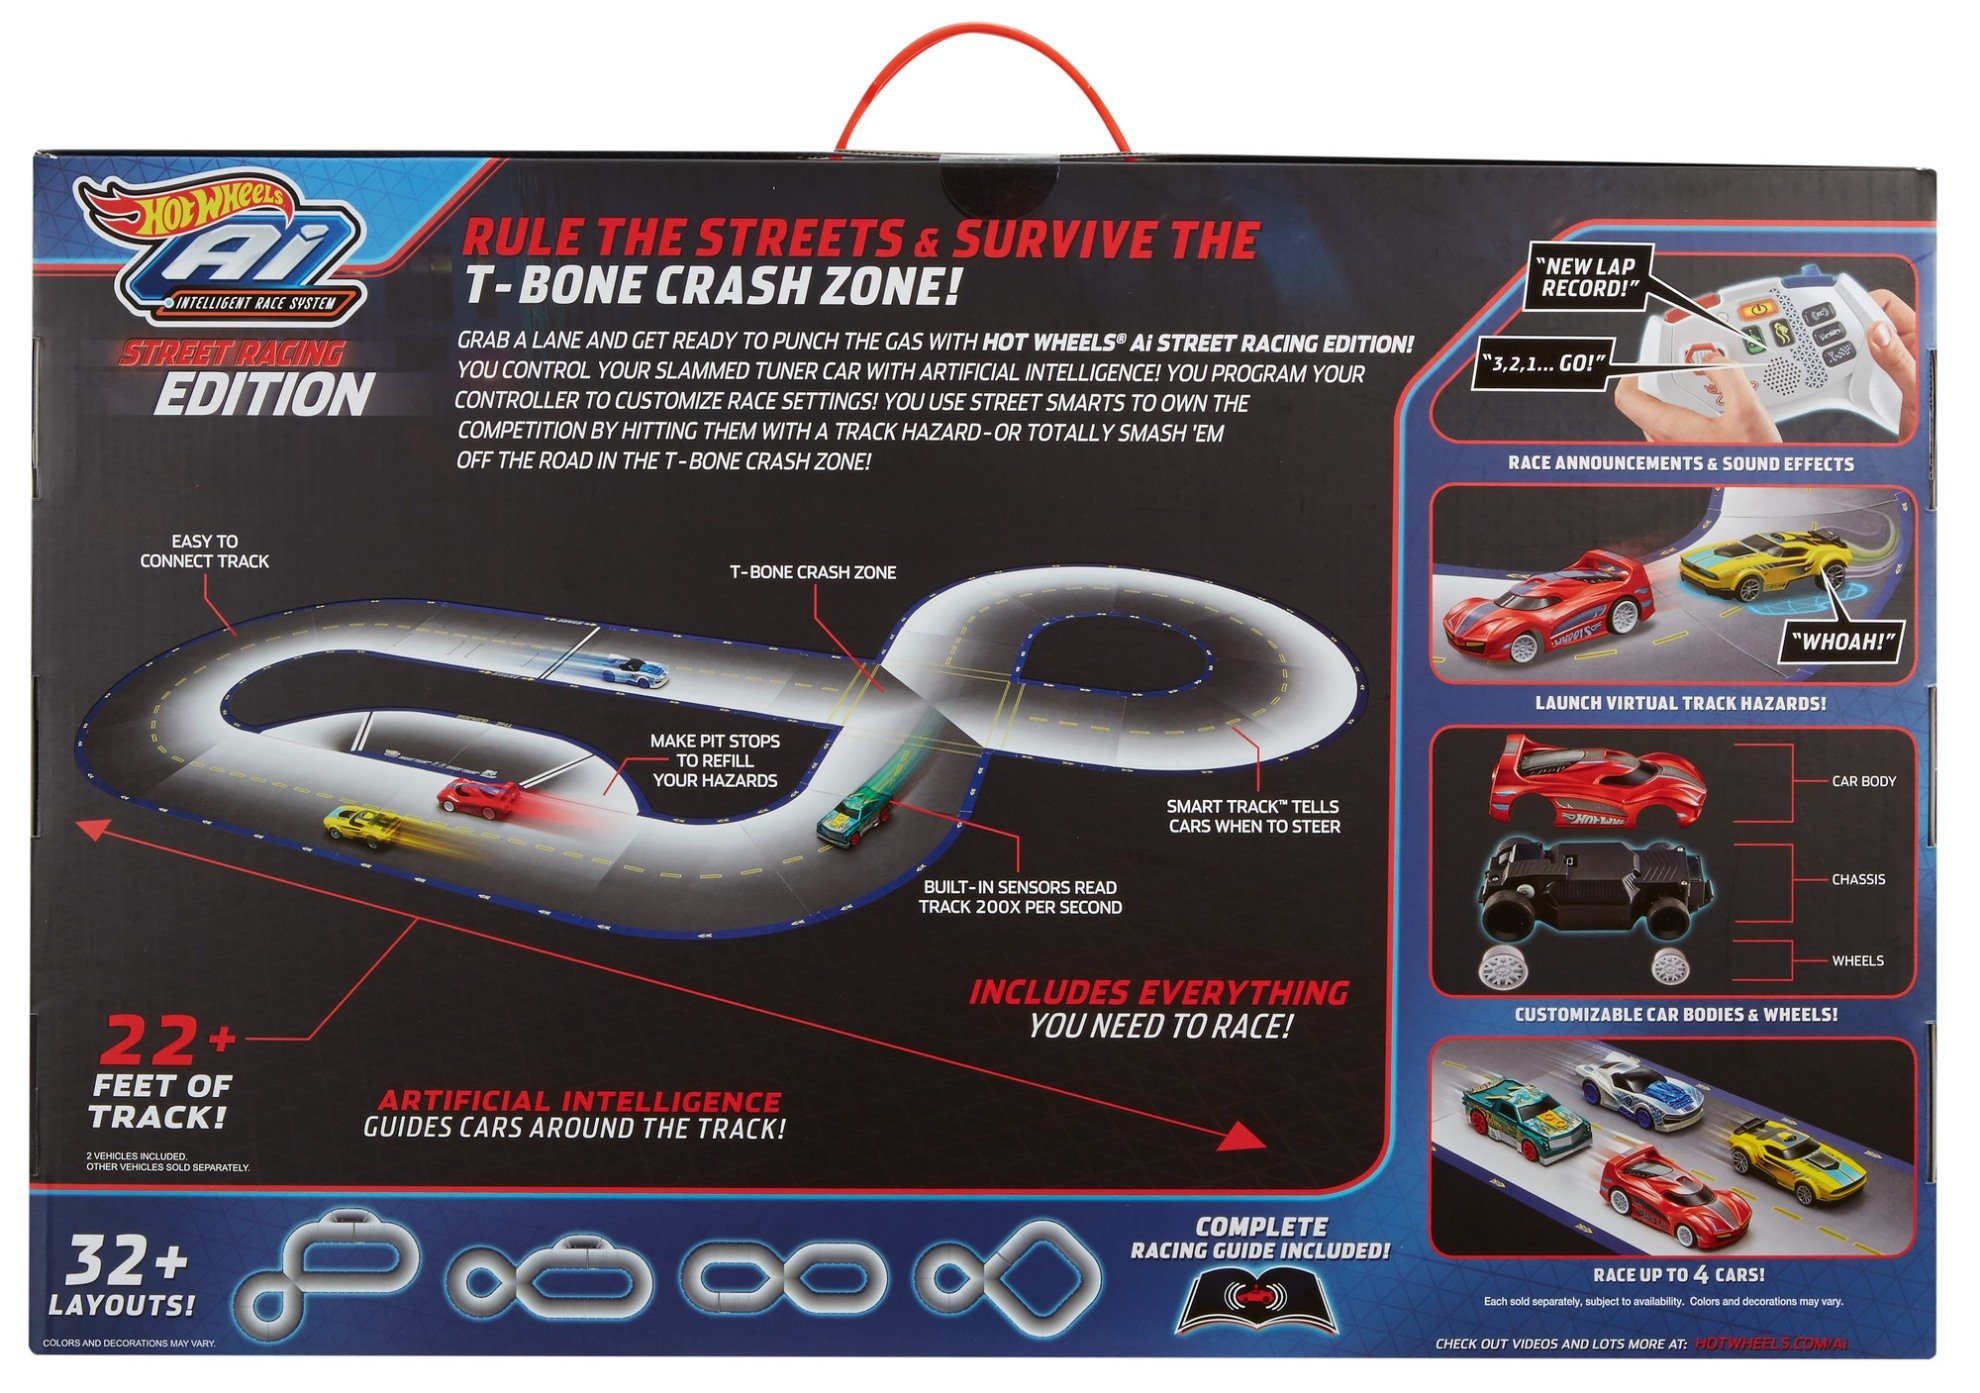 Hot Wheels Ai Starter Set Street Racing Edition by Hot Wheels (Image #23)